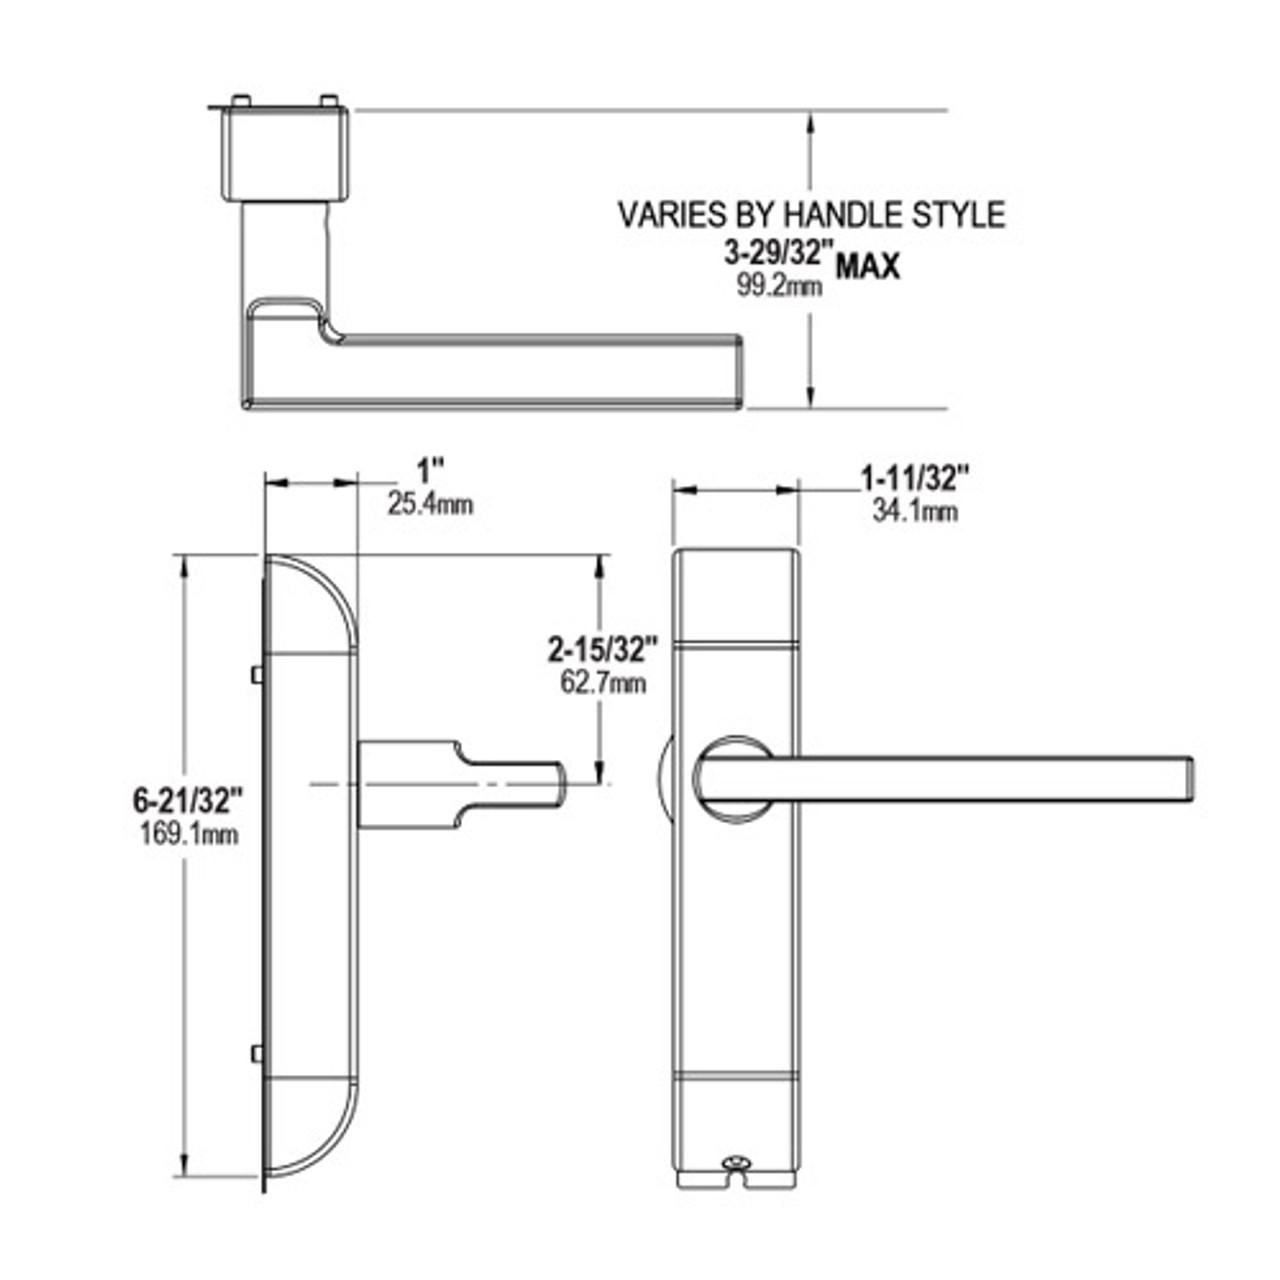 4600-MI-531-US4 Adams Rite MI Designer handle Dimensional View